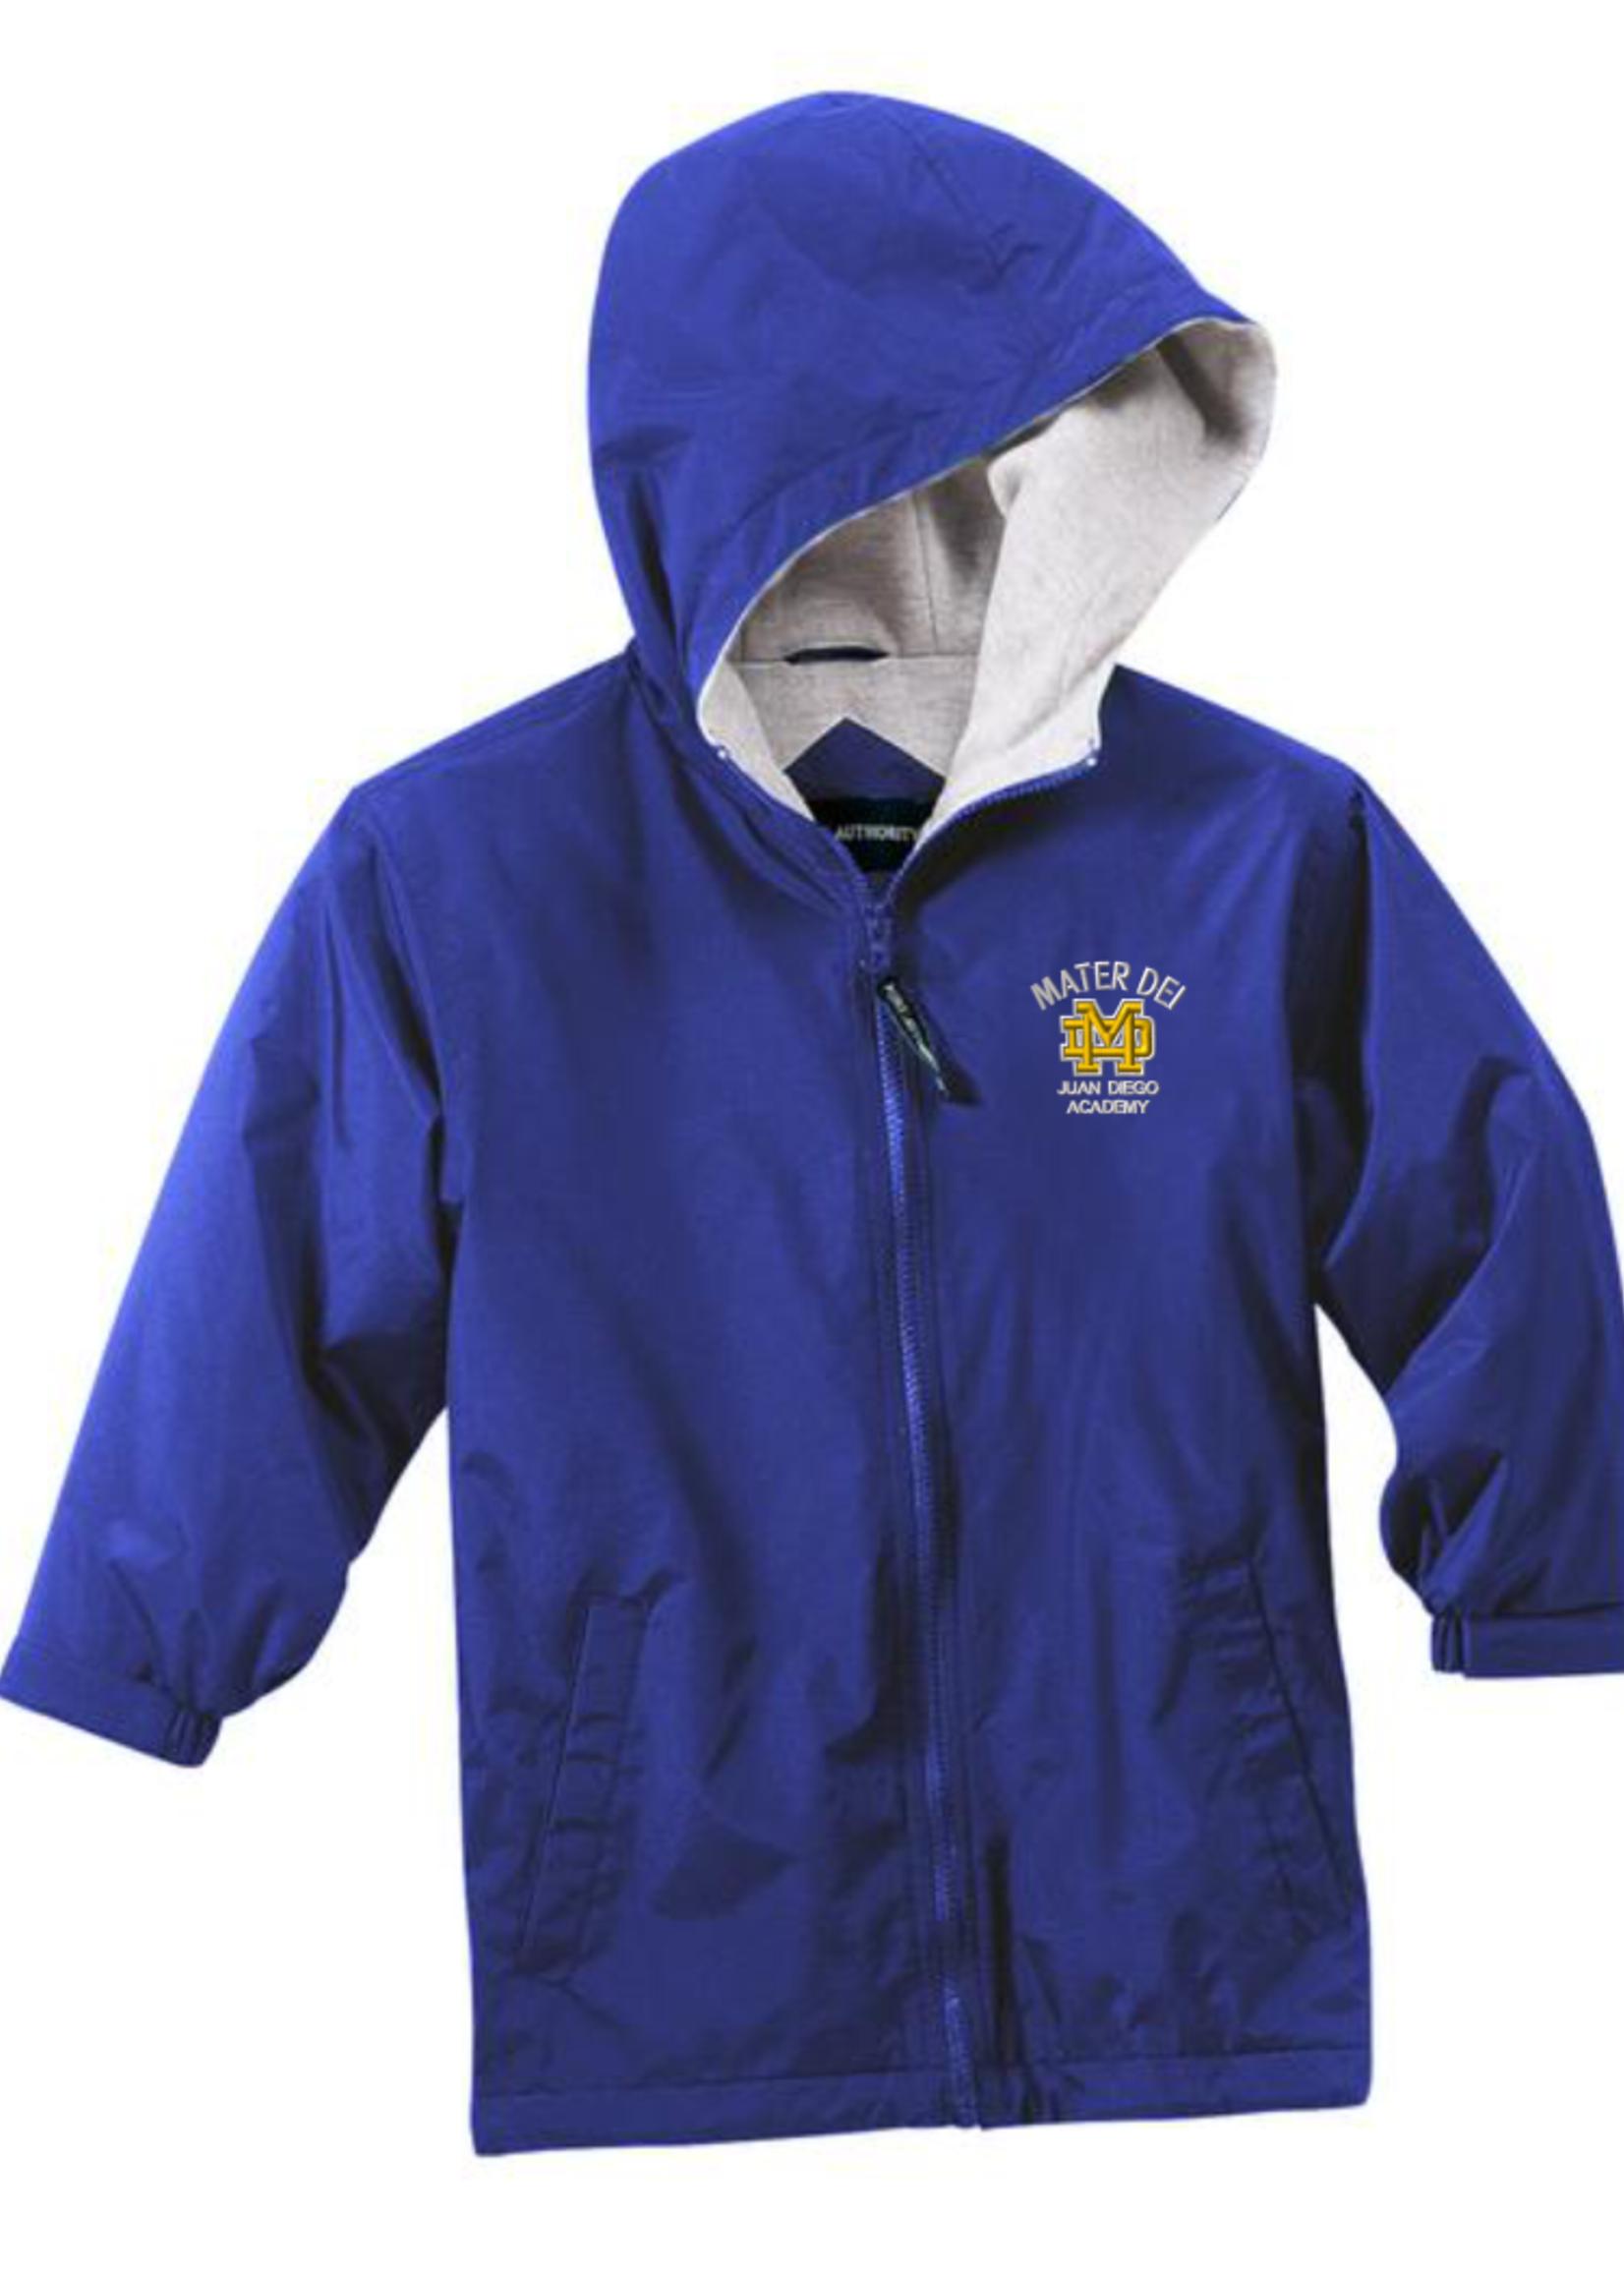 3500 JDA Hooded Full Zip Baywatch Jacket